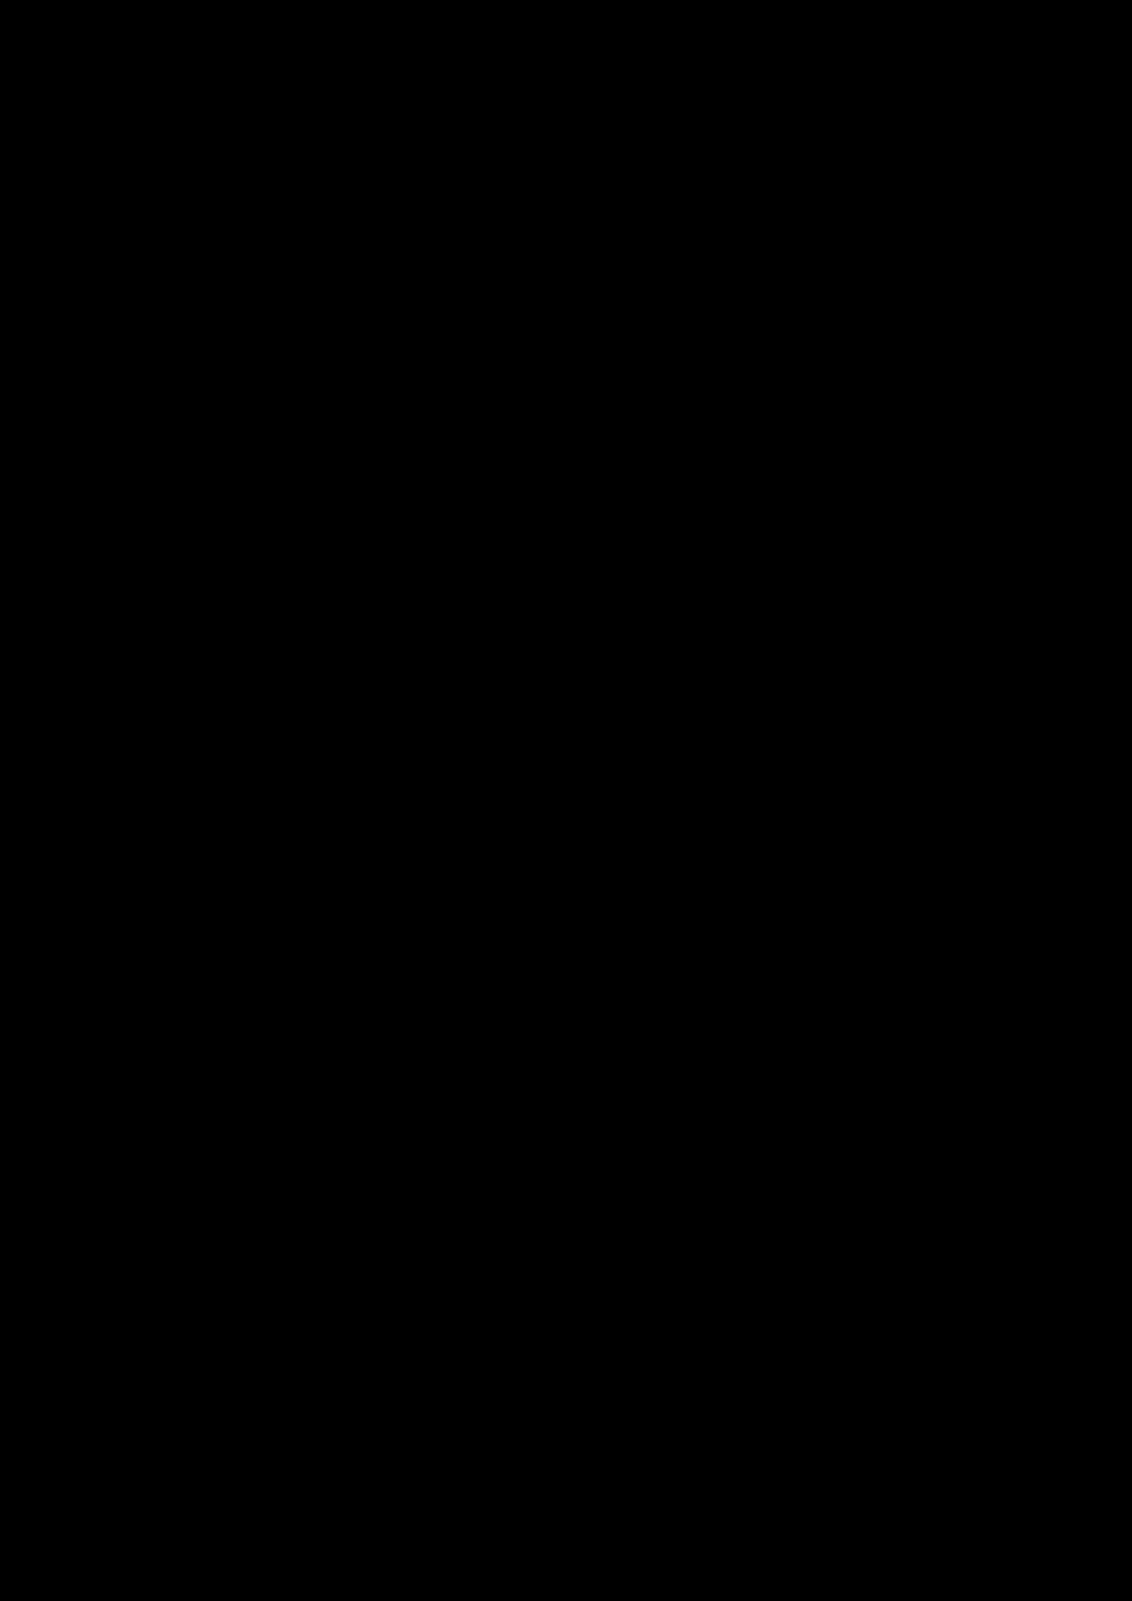 Belyiy sokol slide, Image 128